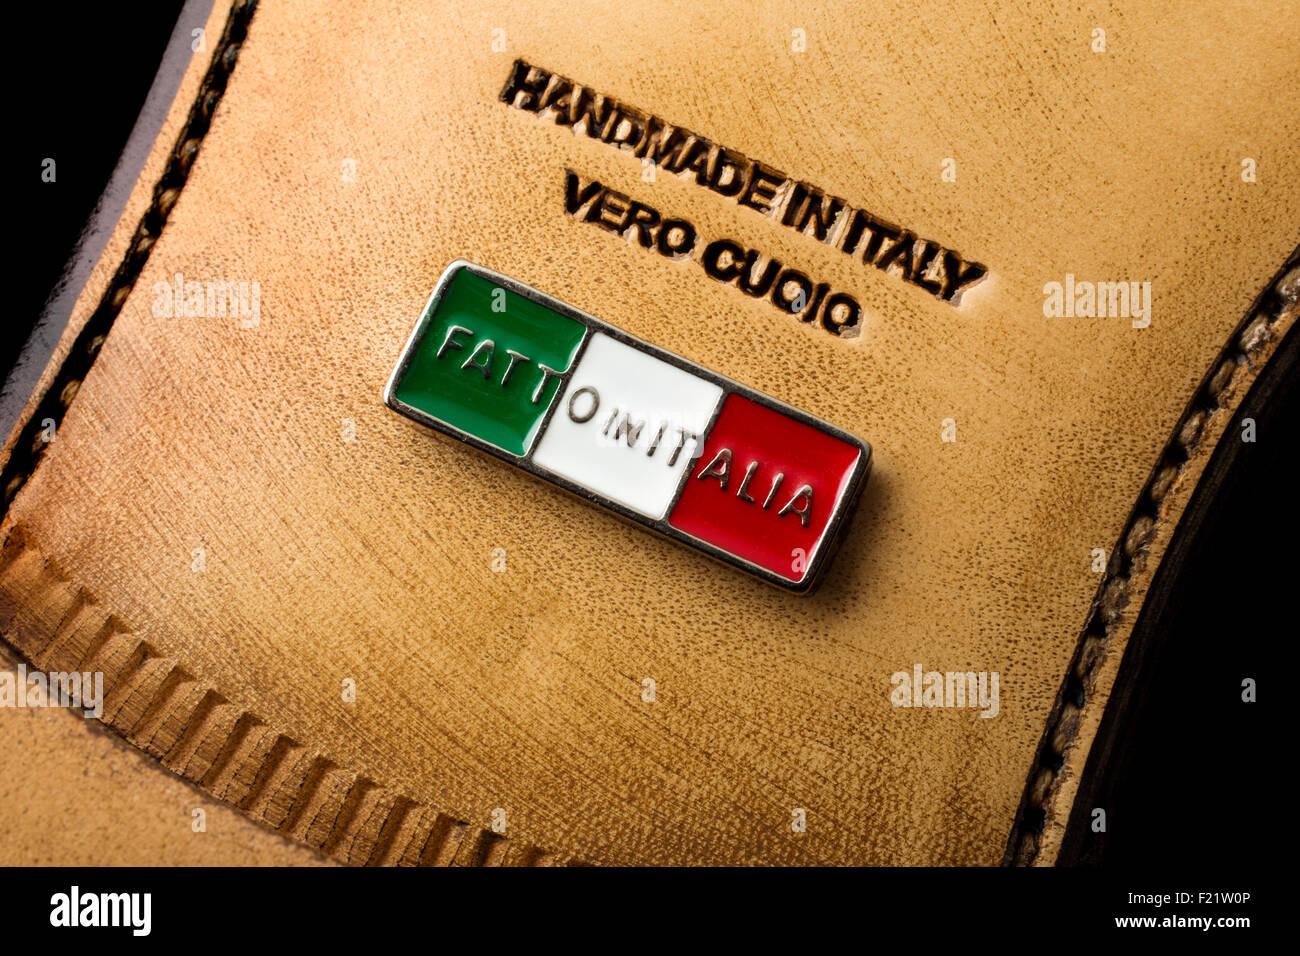 L'artisanat fait main chaussures italiennes Photo Stock